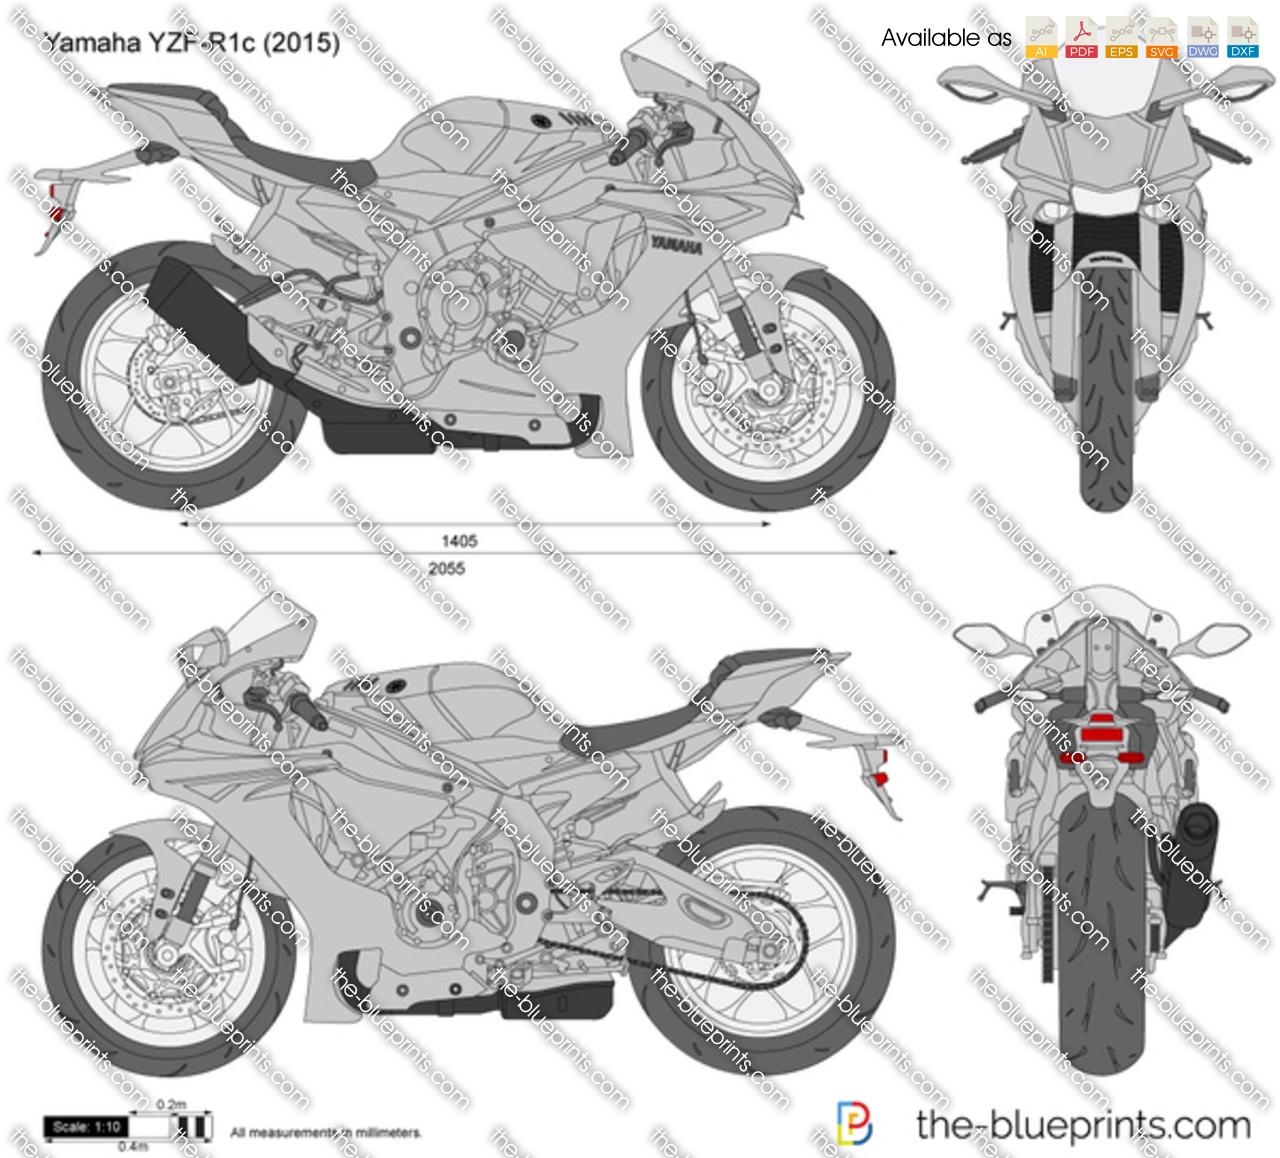 Yamaha YZF-R1c vector drawing